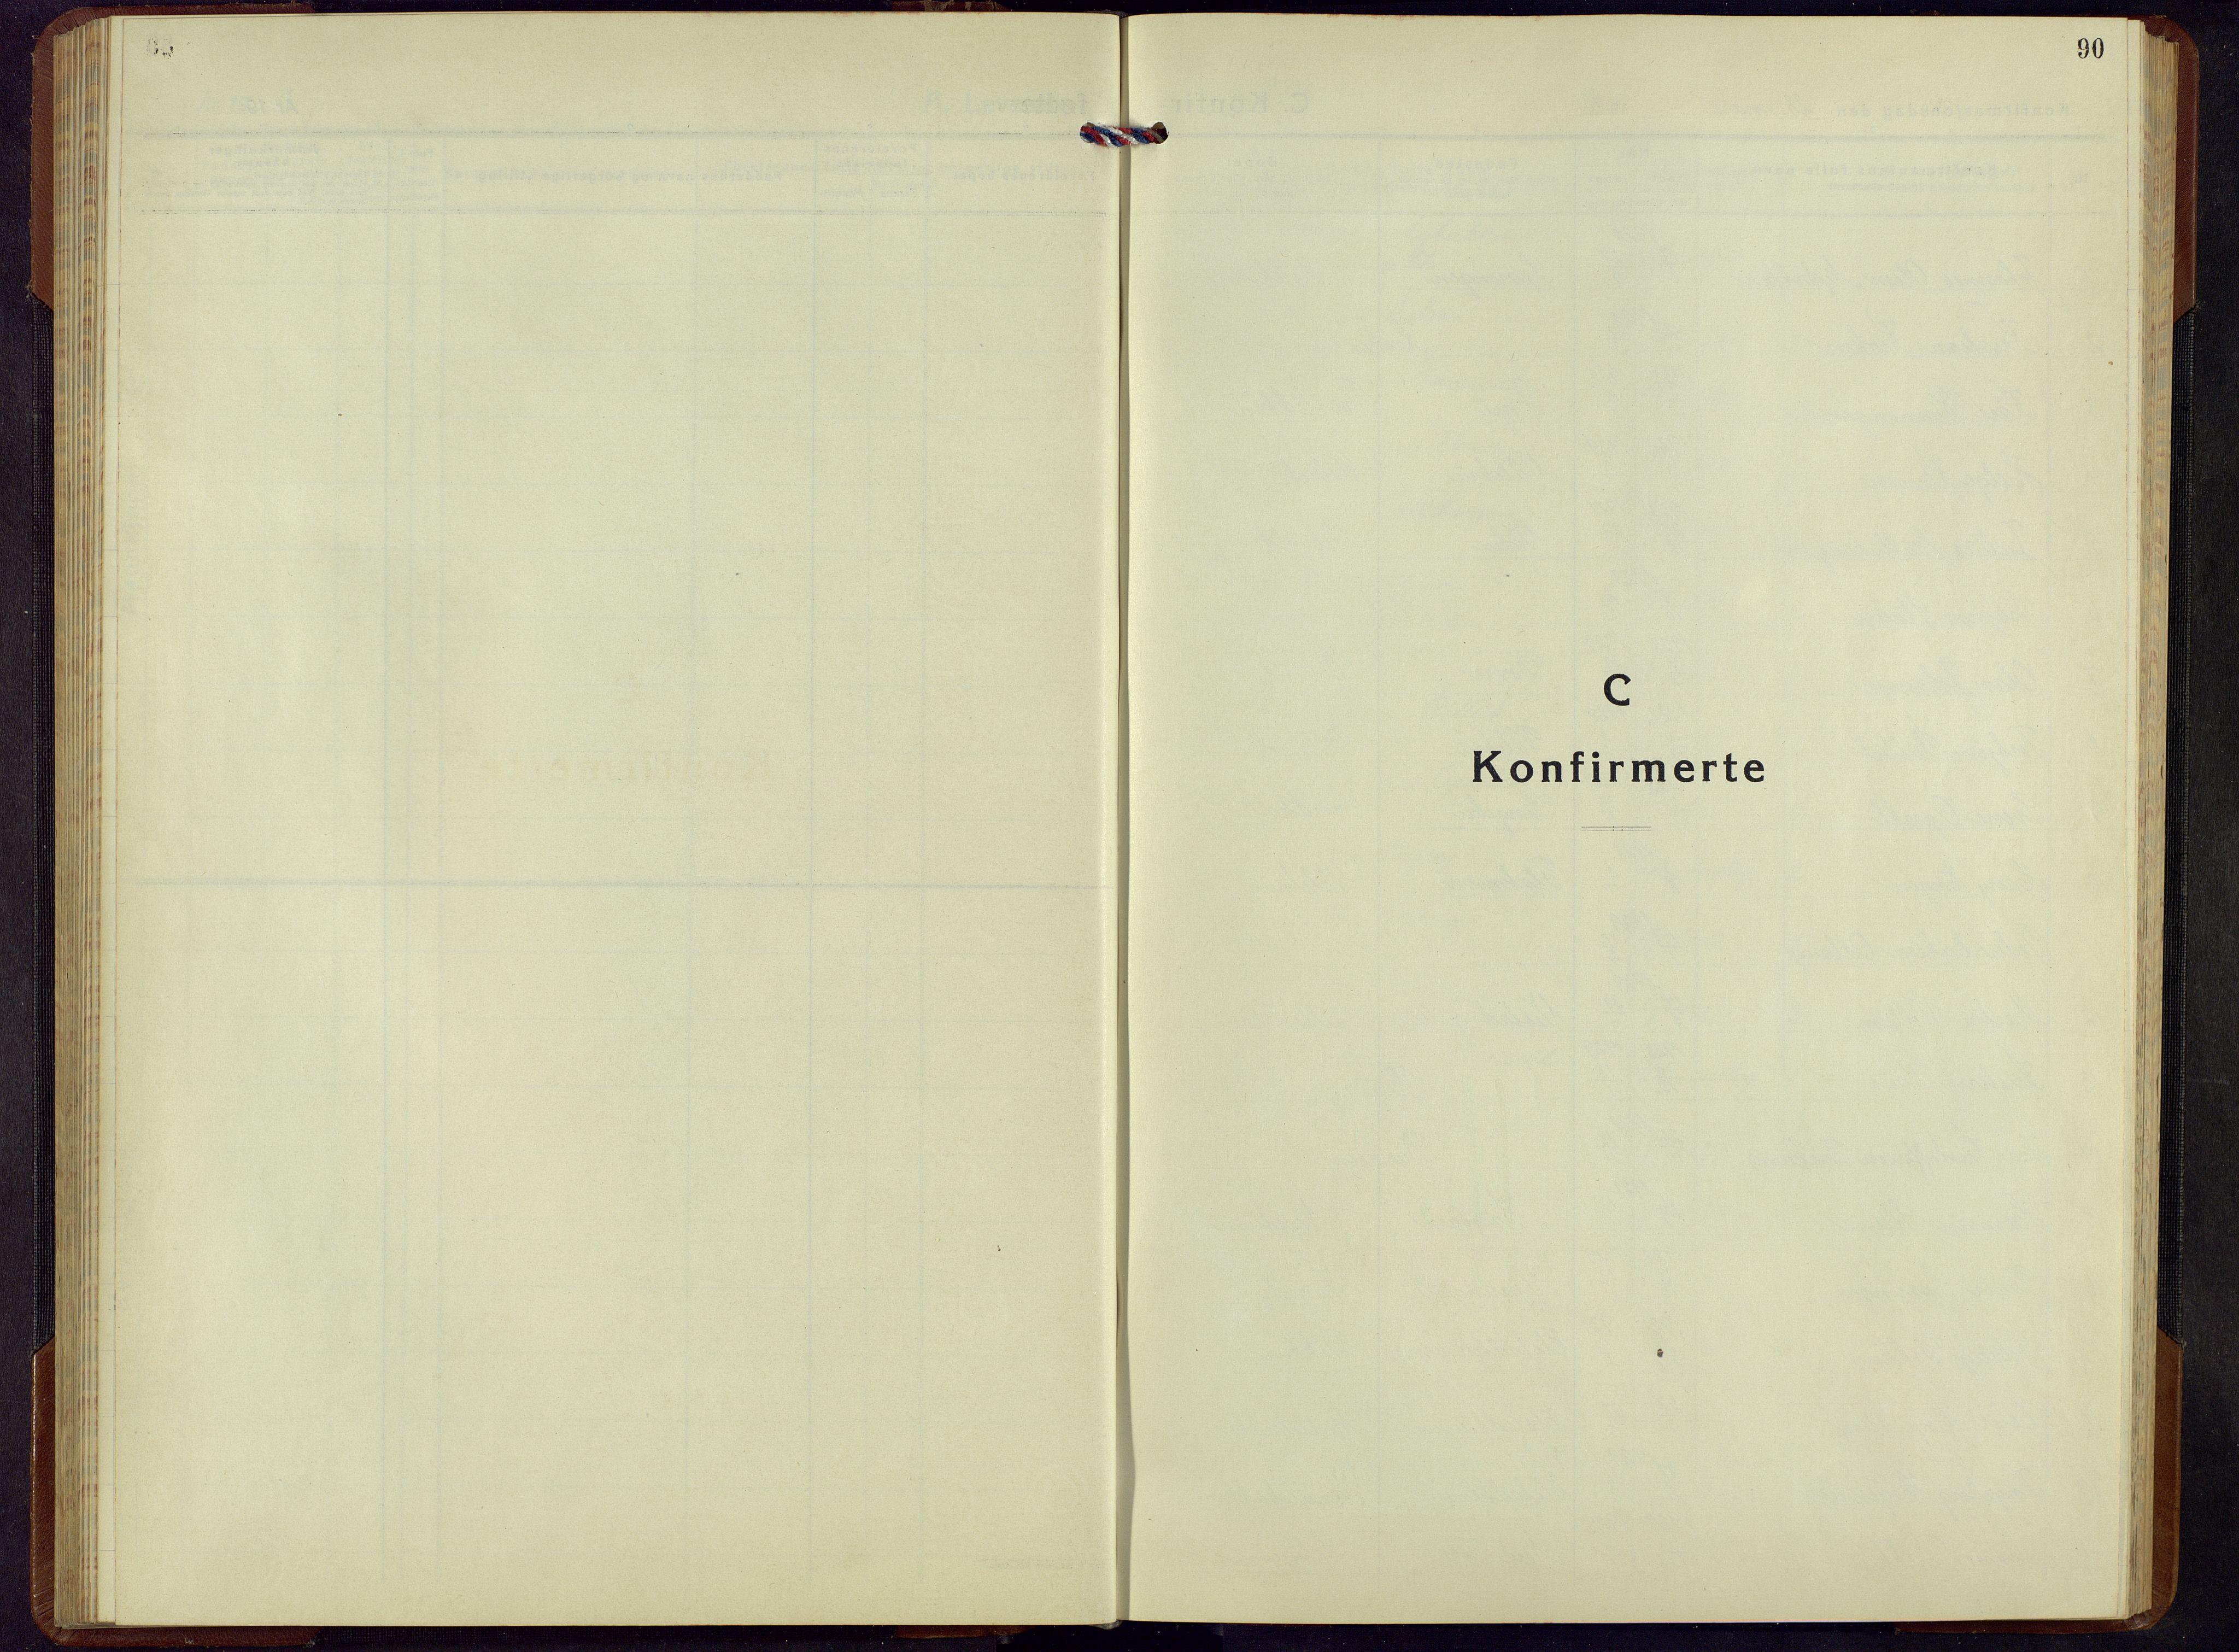 SAH, Ringebu prestekontor, Klokkerbok nr. 13, 1943-1956, s. 90